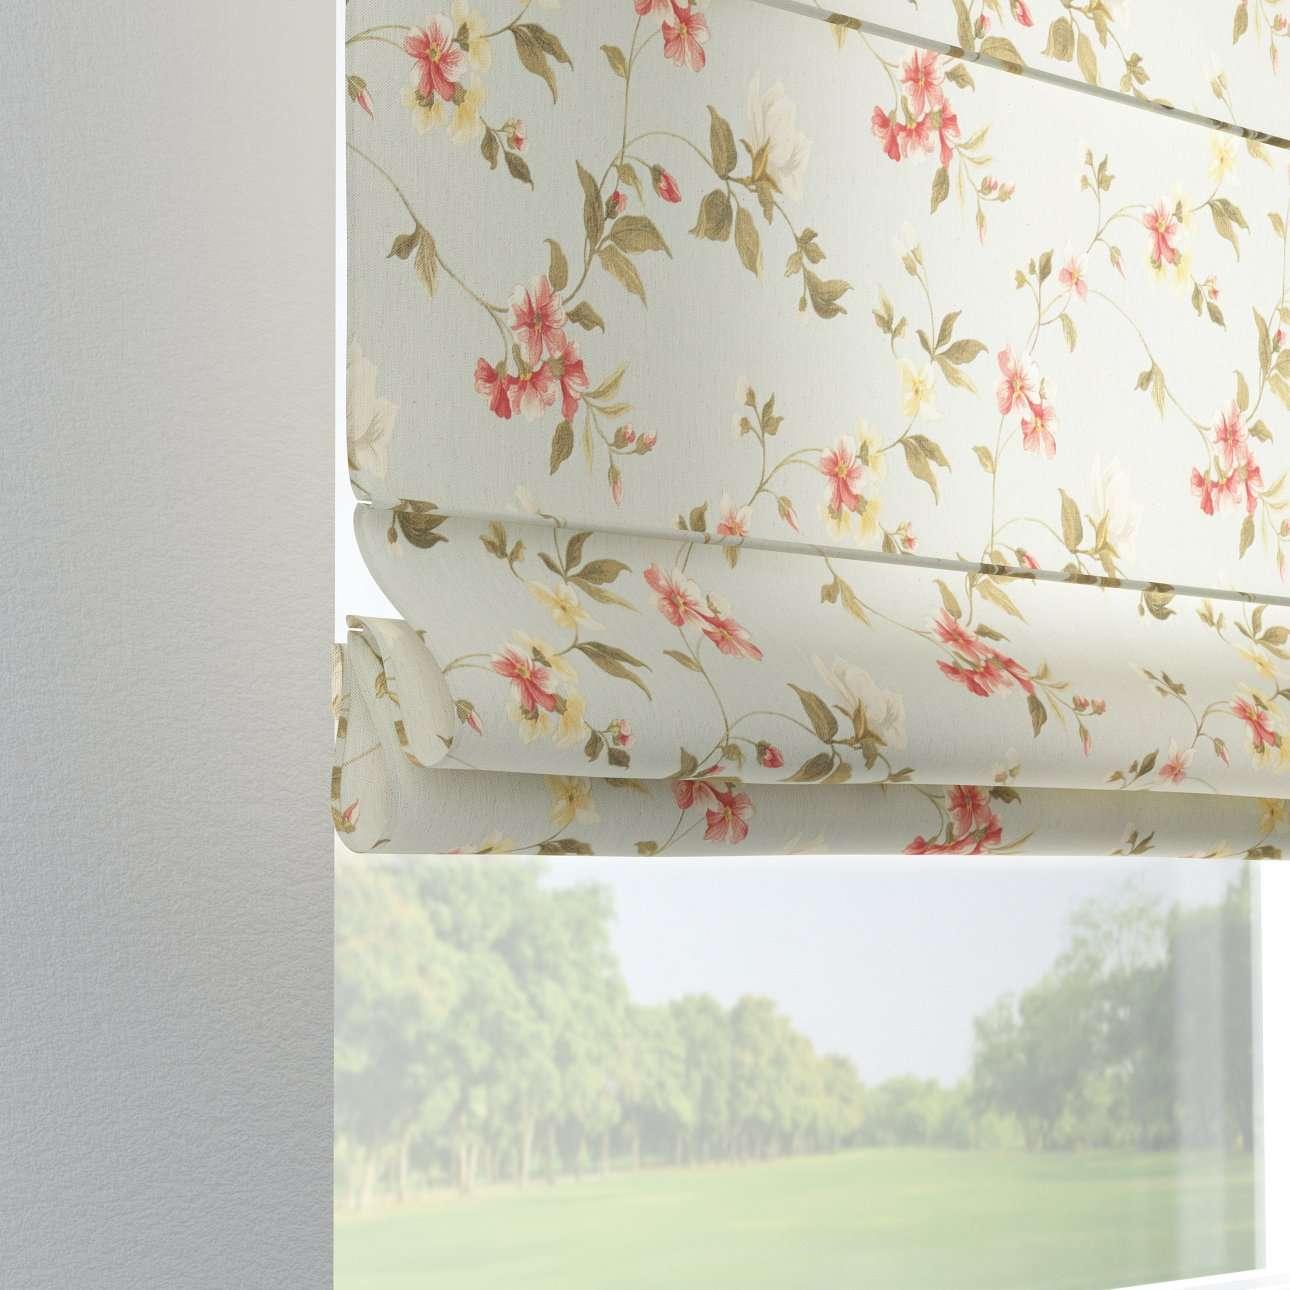 Foldegardin Verona<br/>Med stropper til gardinstang 80 x 170 cm fra kollektionen Londres, Stof: 124-65